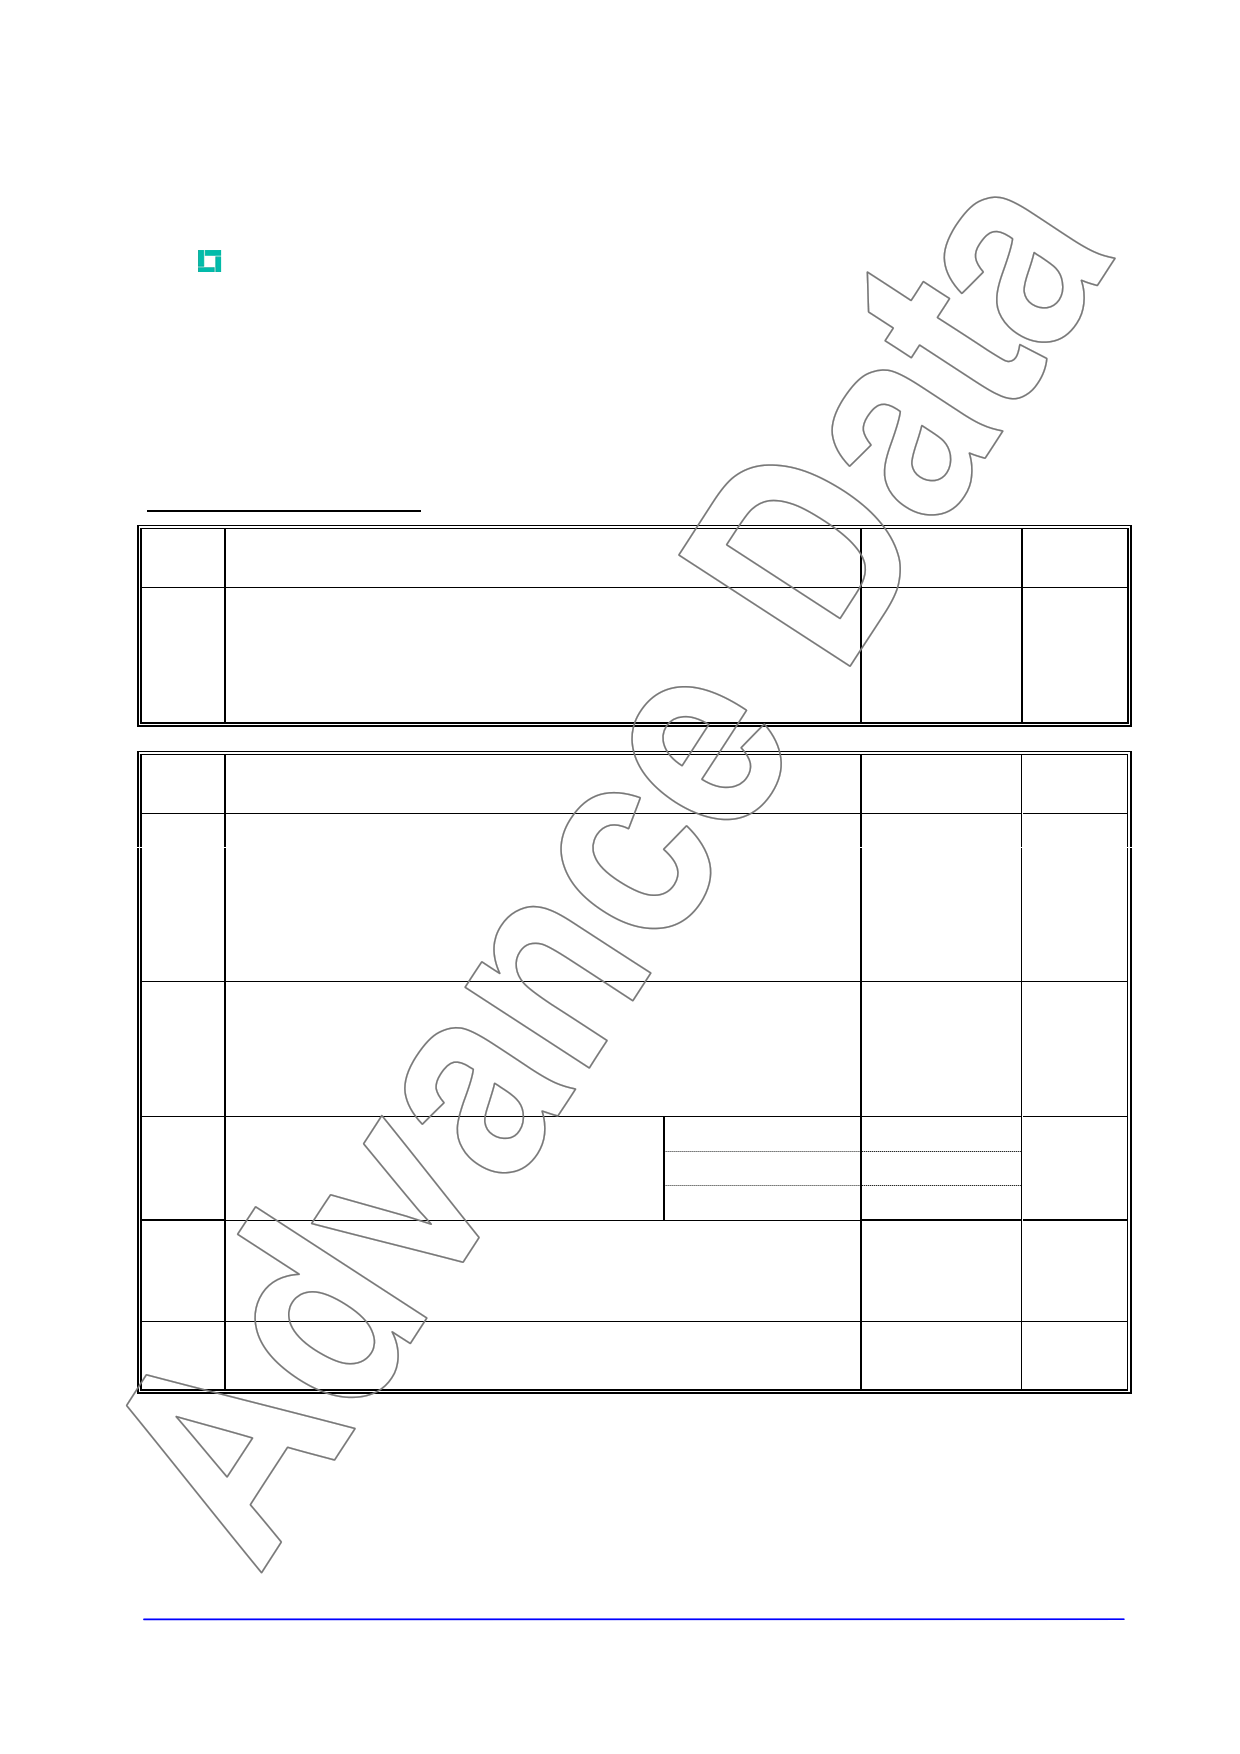 K0620QA640 datasheet